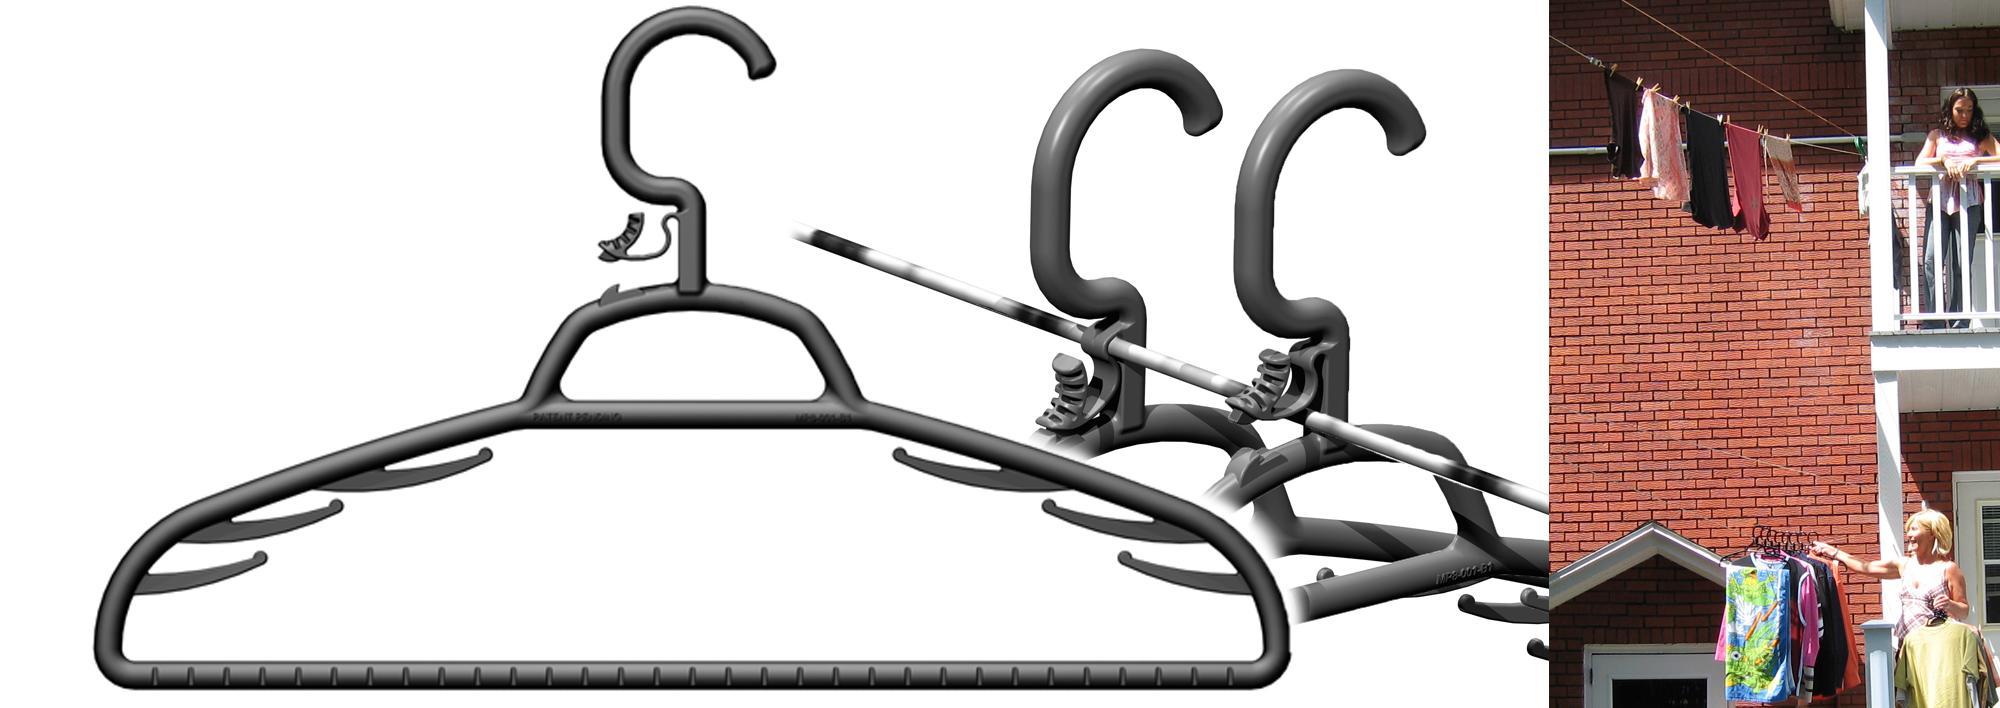 Designer industriel conception et d veloppement de produit for Innovation in product and industrial design